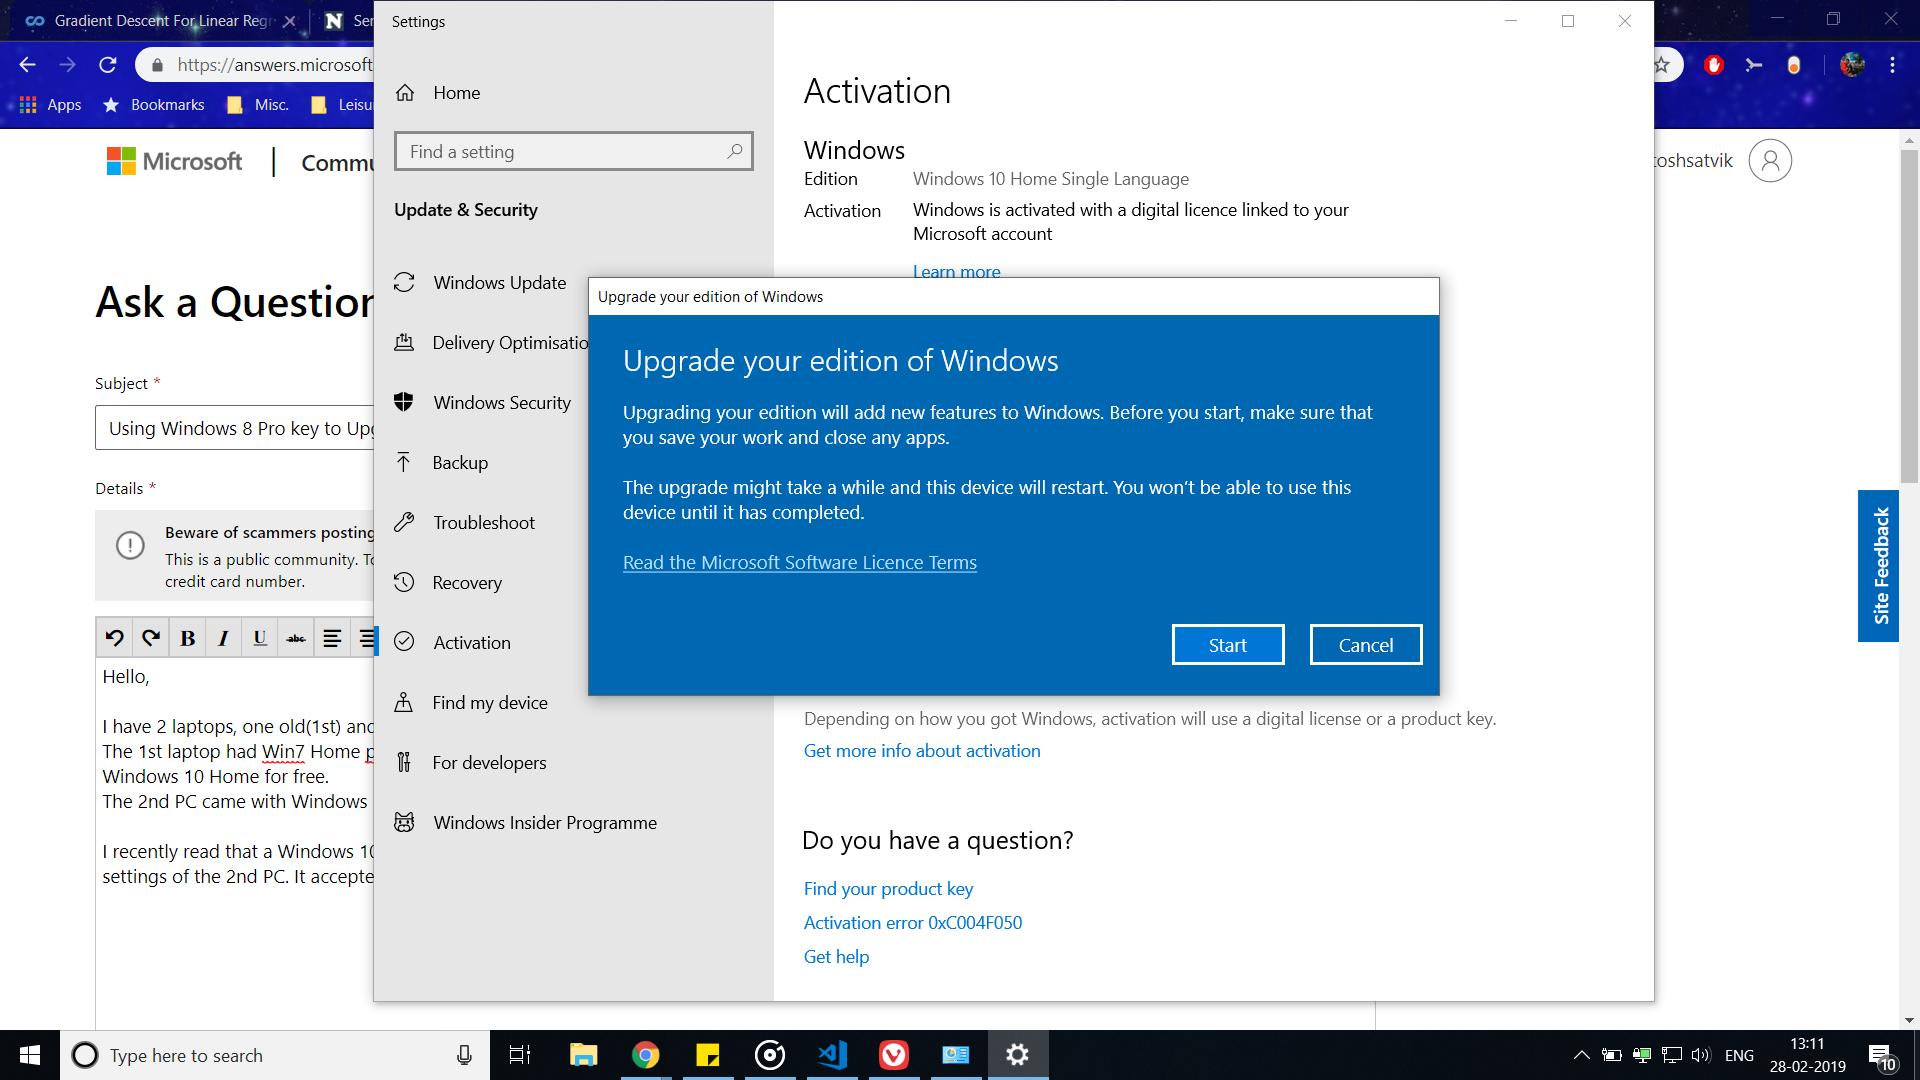 Using Windows 8 Pro key to Upgrade to Windows 10 Pro from Home b8b4dc3e-e56f-4958-94f1-ef07a68d3448?upload=true.png